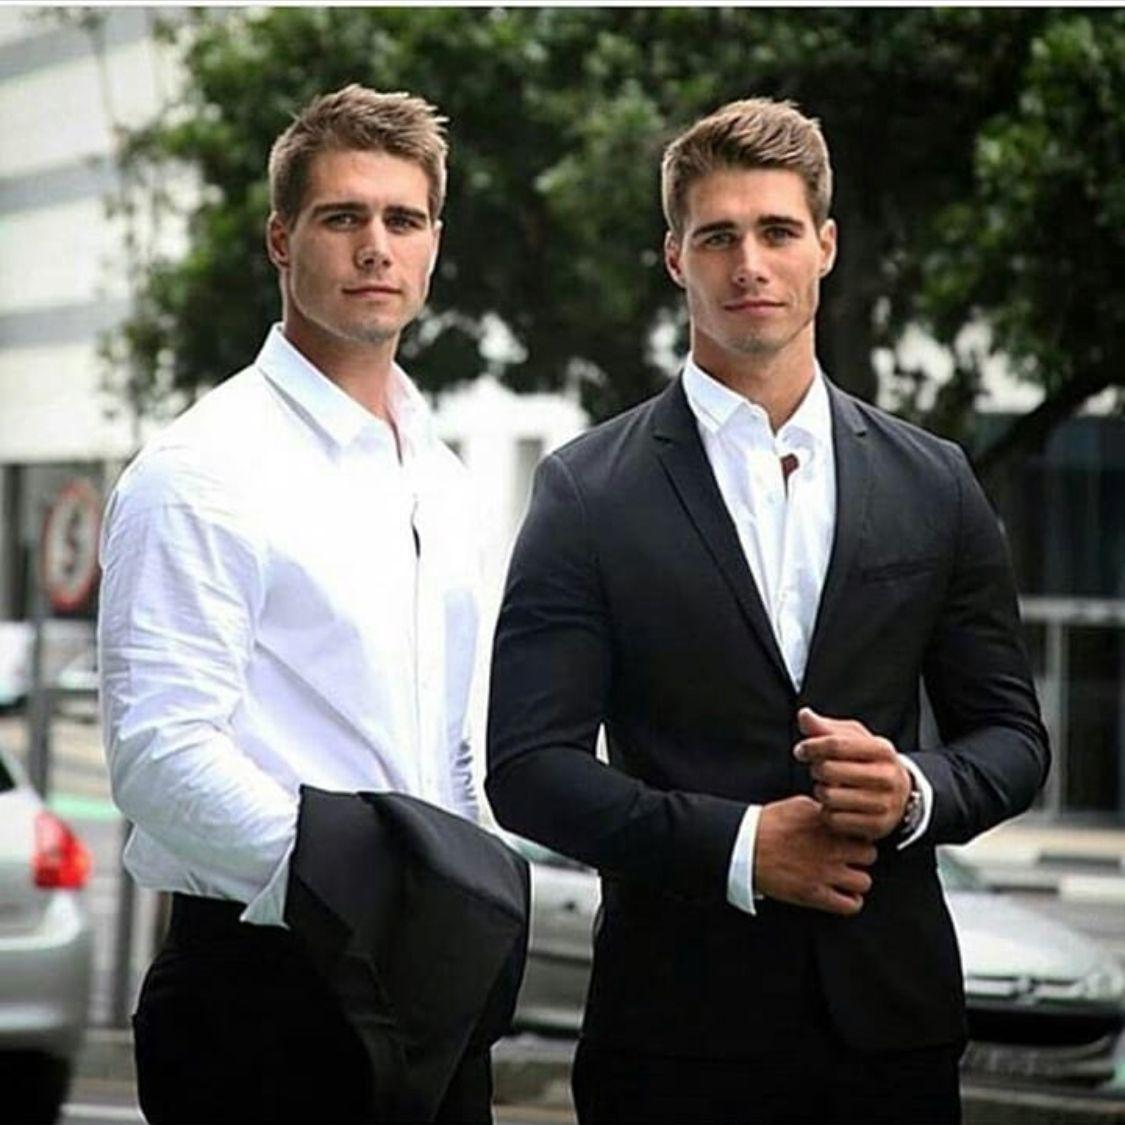 Australian man dating twins